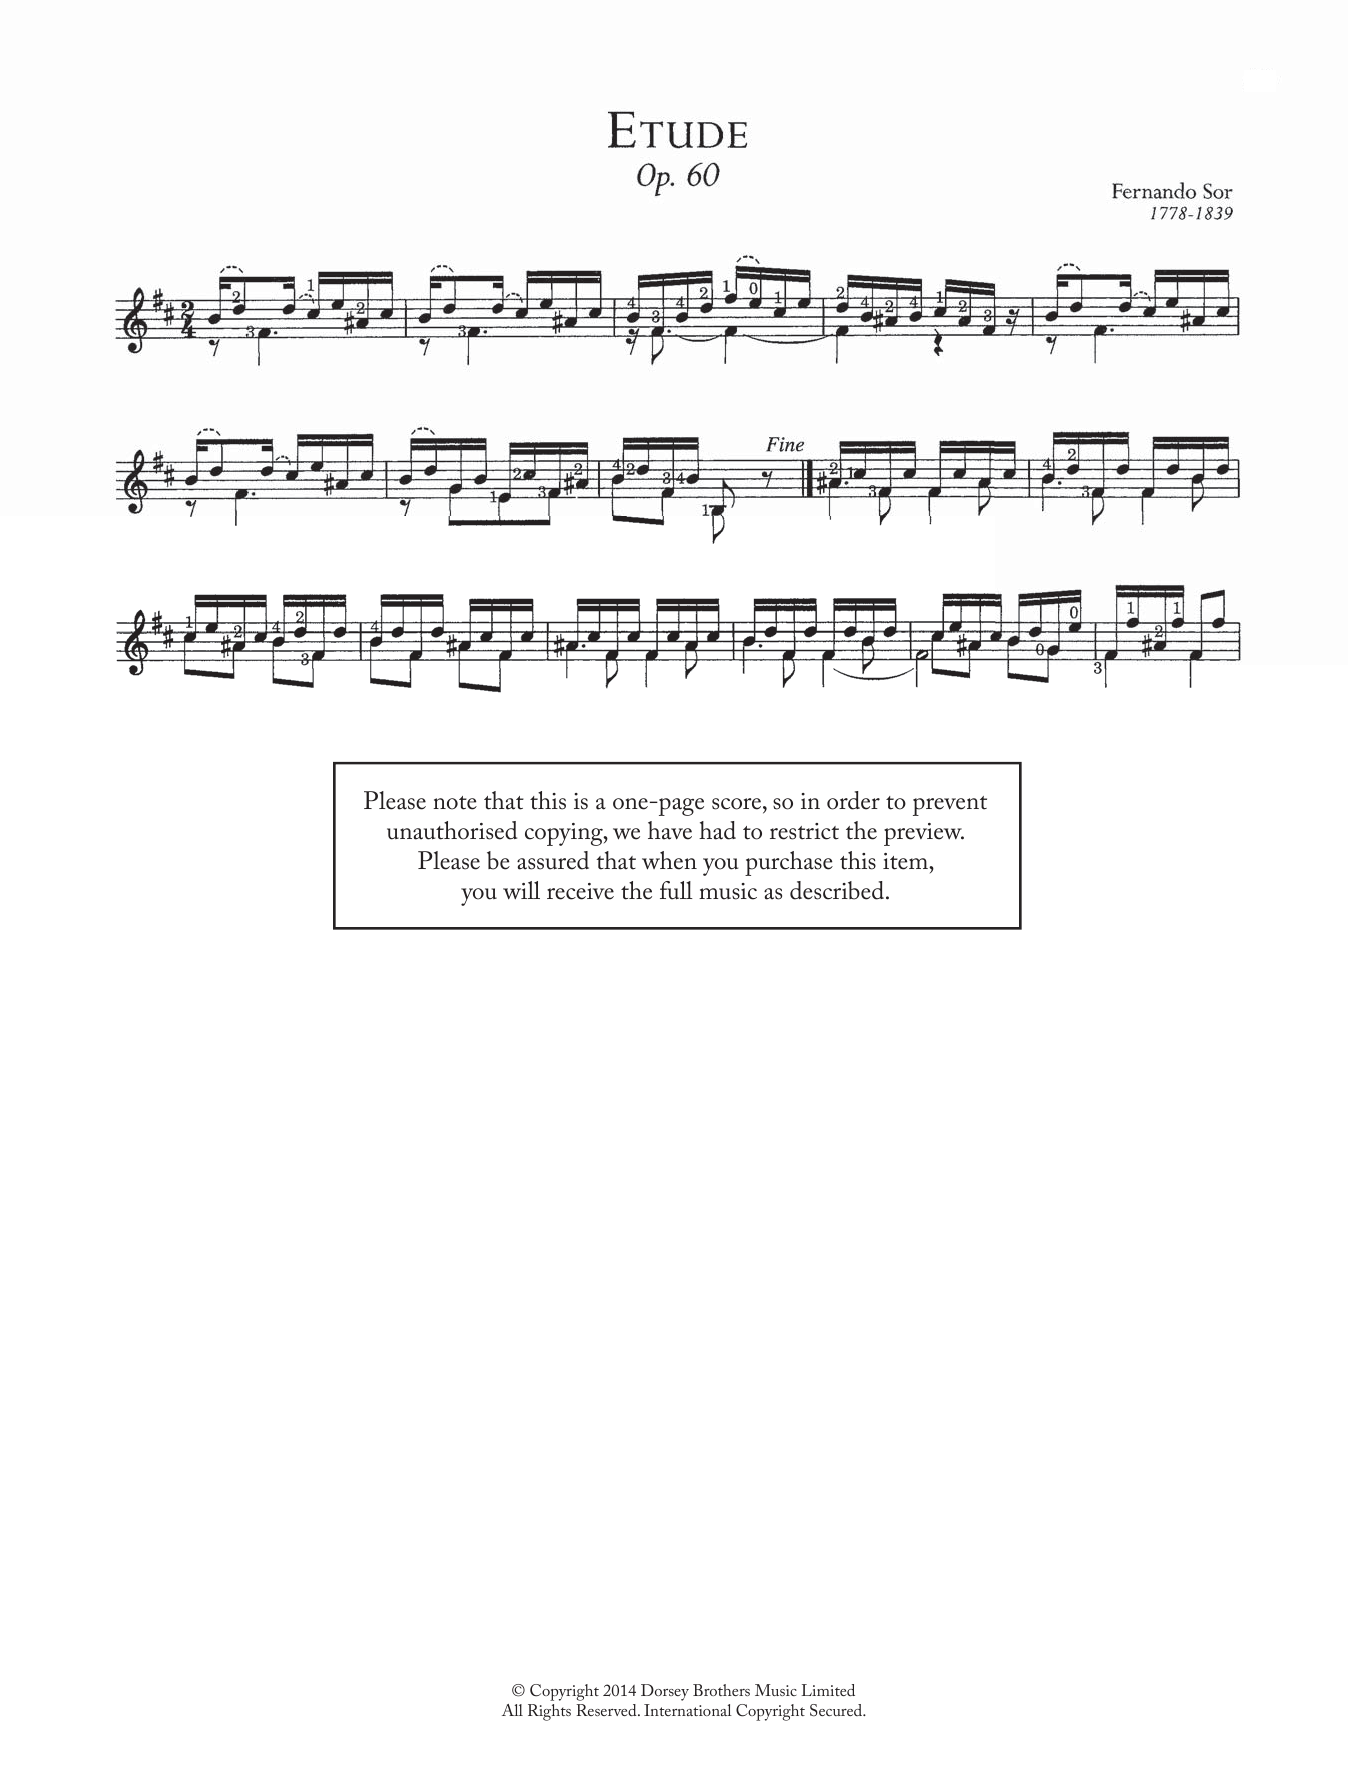 Fernando Sor - Etude, Op.60